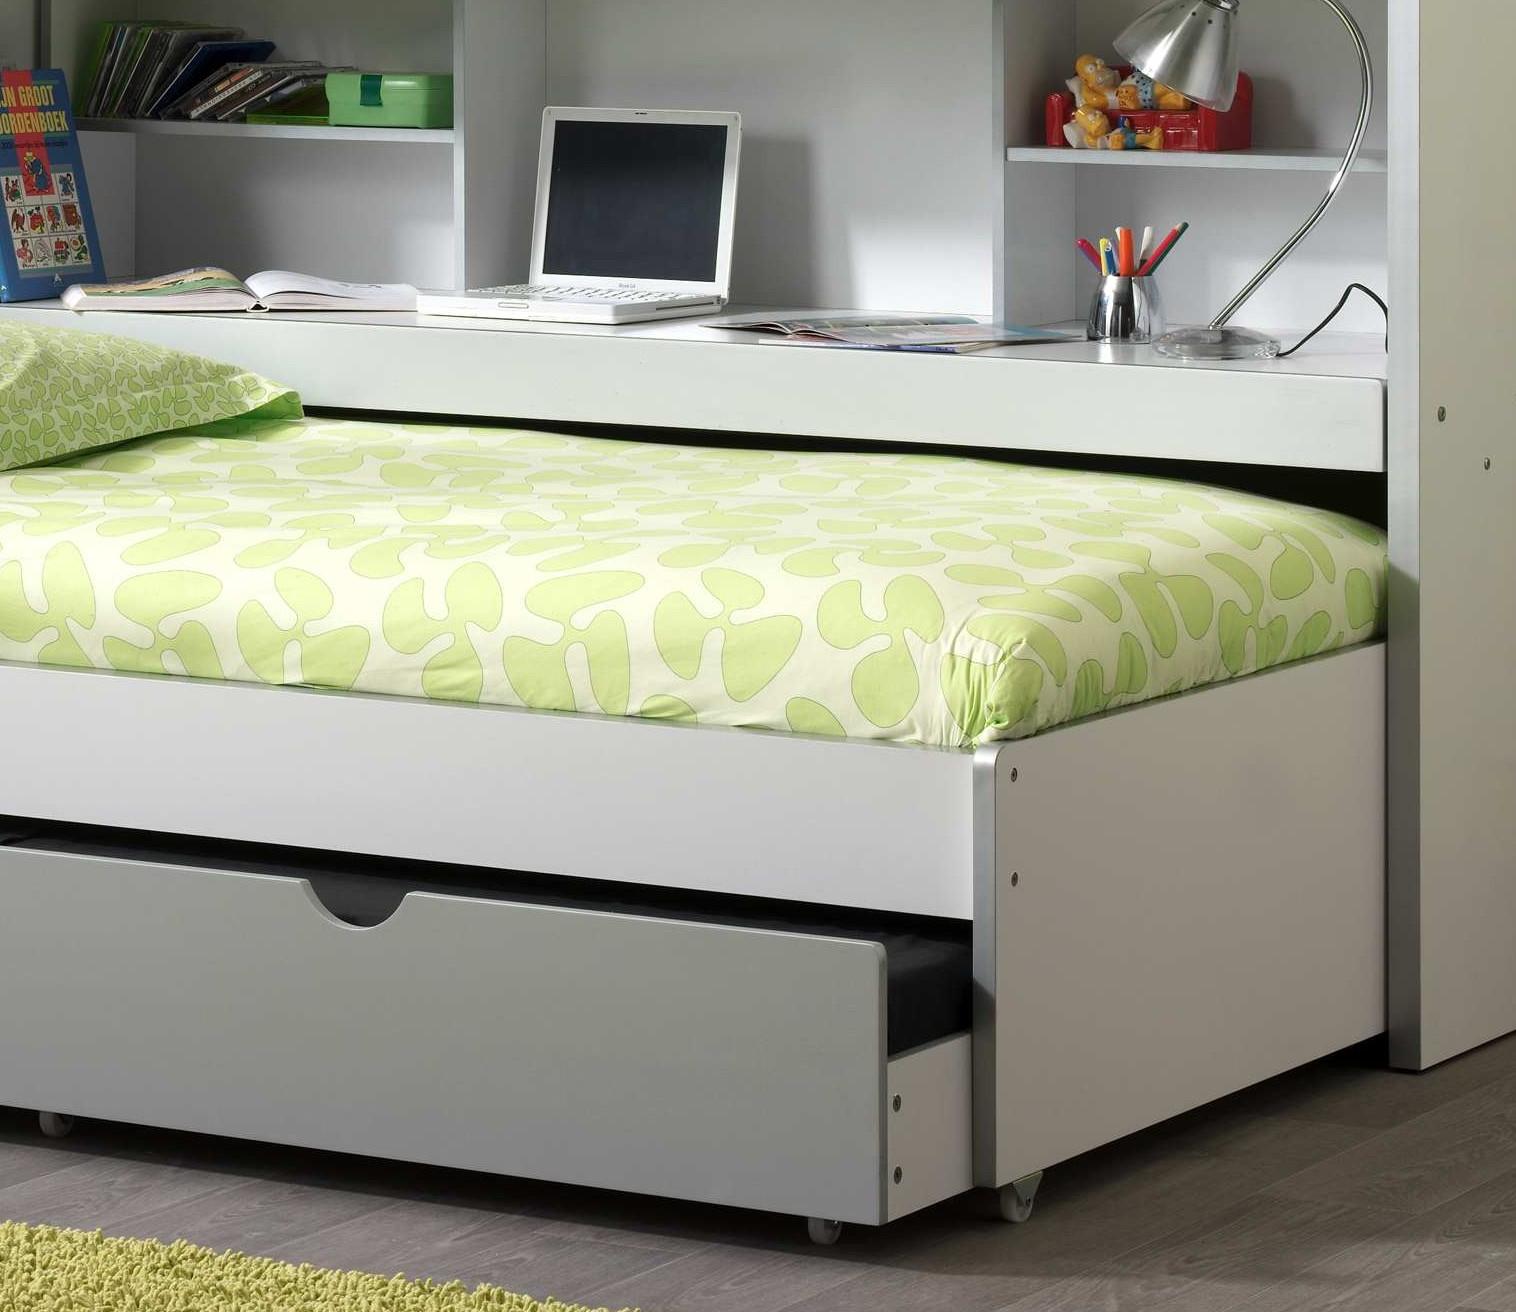 etagenbett bonny multifunktionsbett hochbett 2 liegefl chen 90x200 wei grau ebay. Black Bedroom Furniture Sets. Home Design Ideas